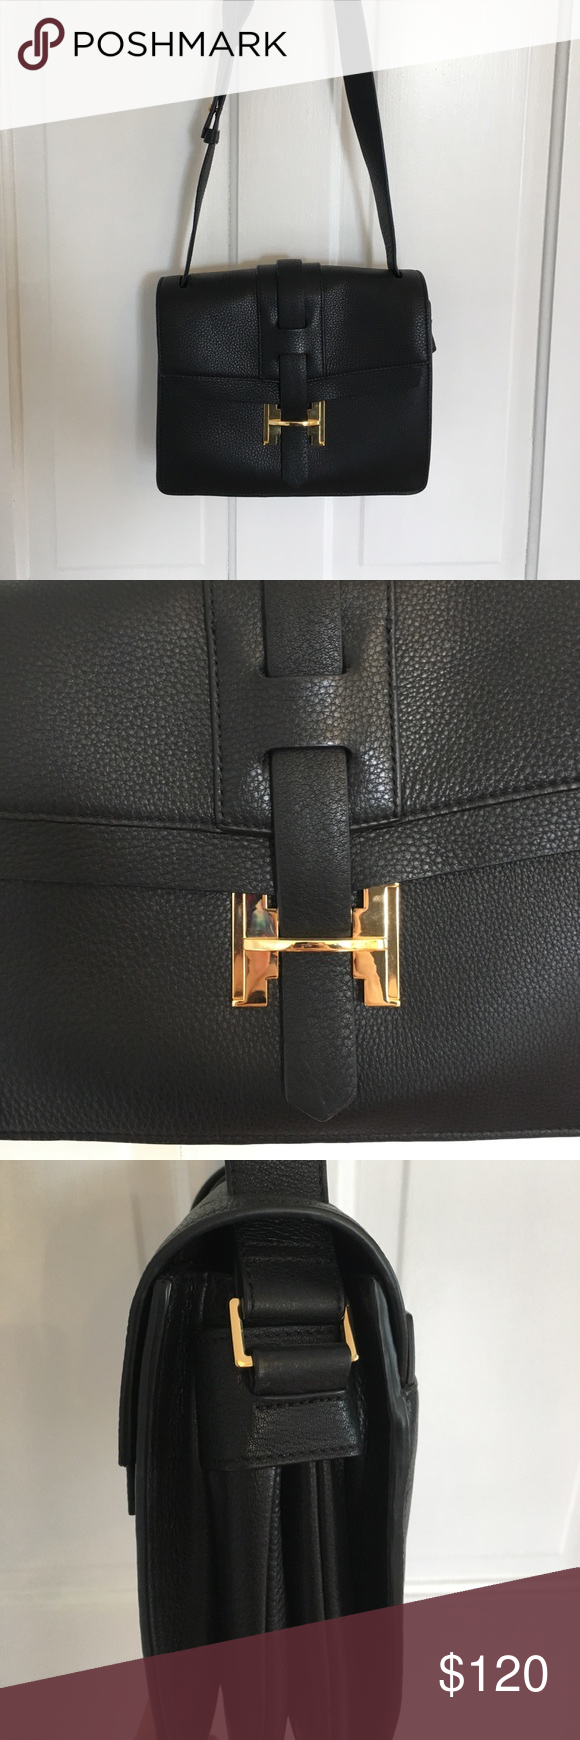 51001e225f3 Halston Heritage Bag GORGEOUS Halston Heritage shoulder bag with shiny gold  hardware. BNWT. it s